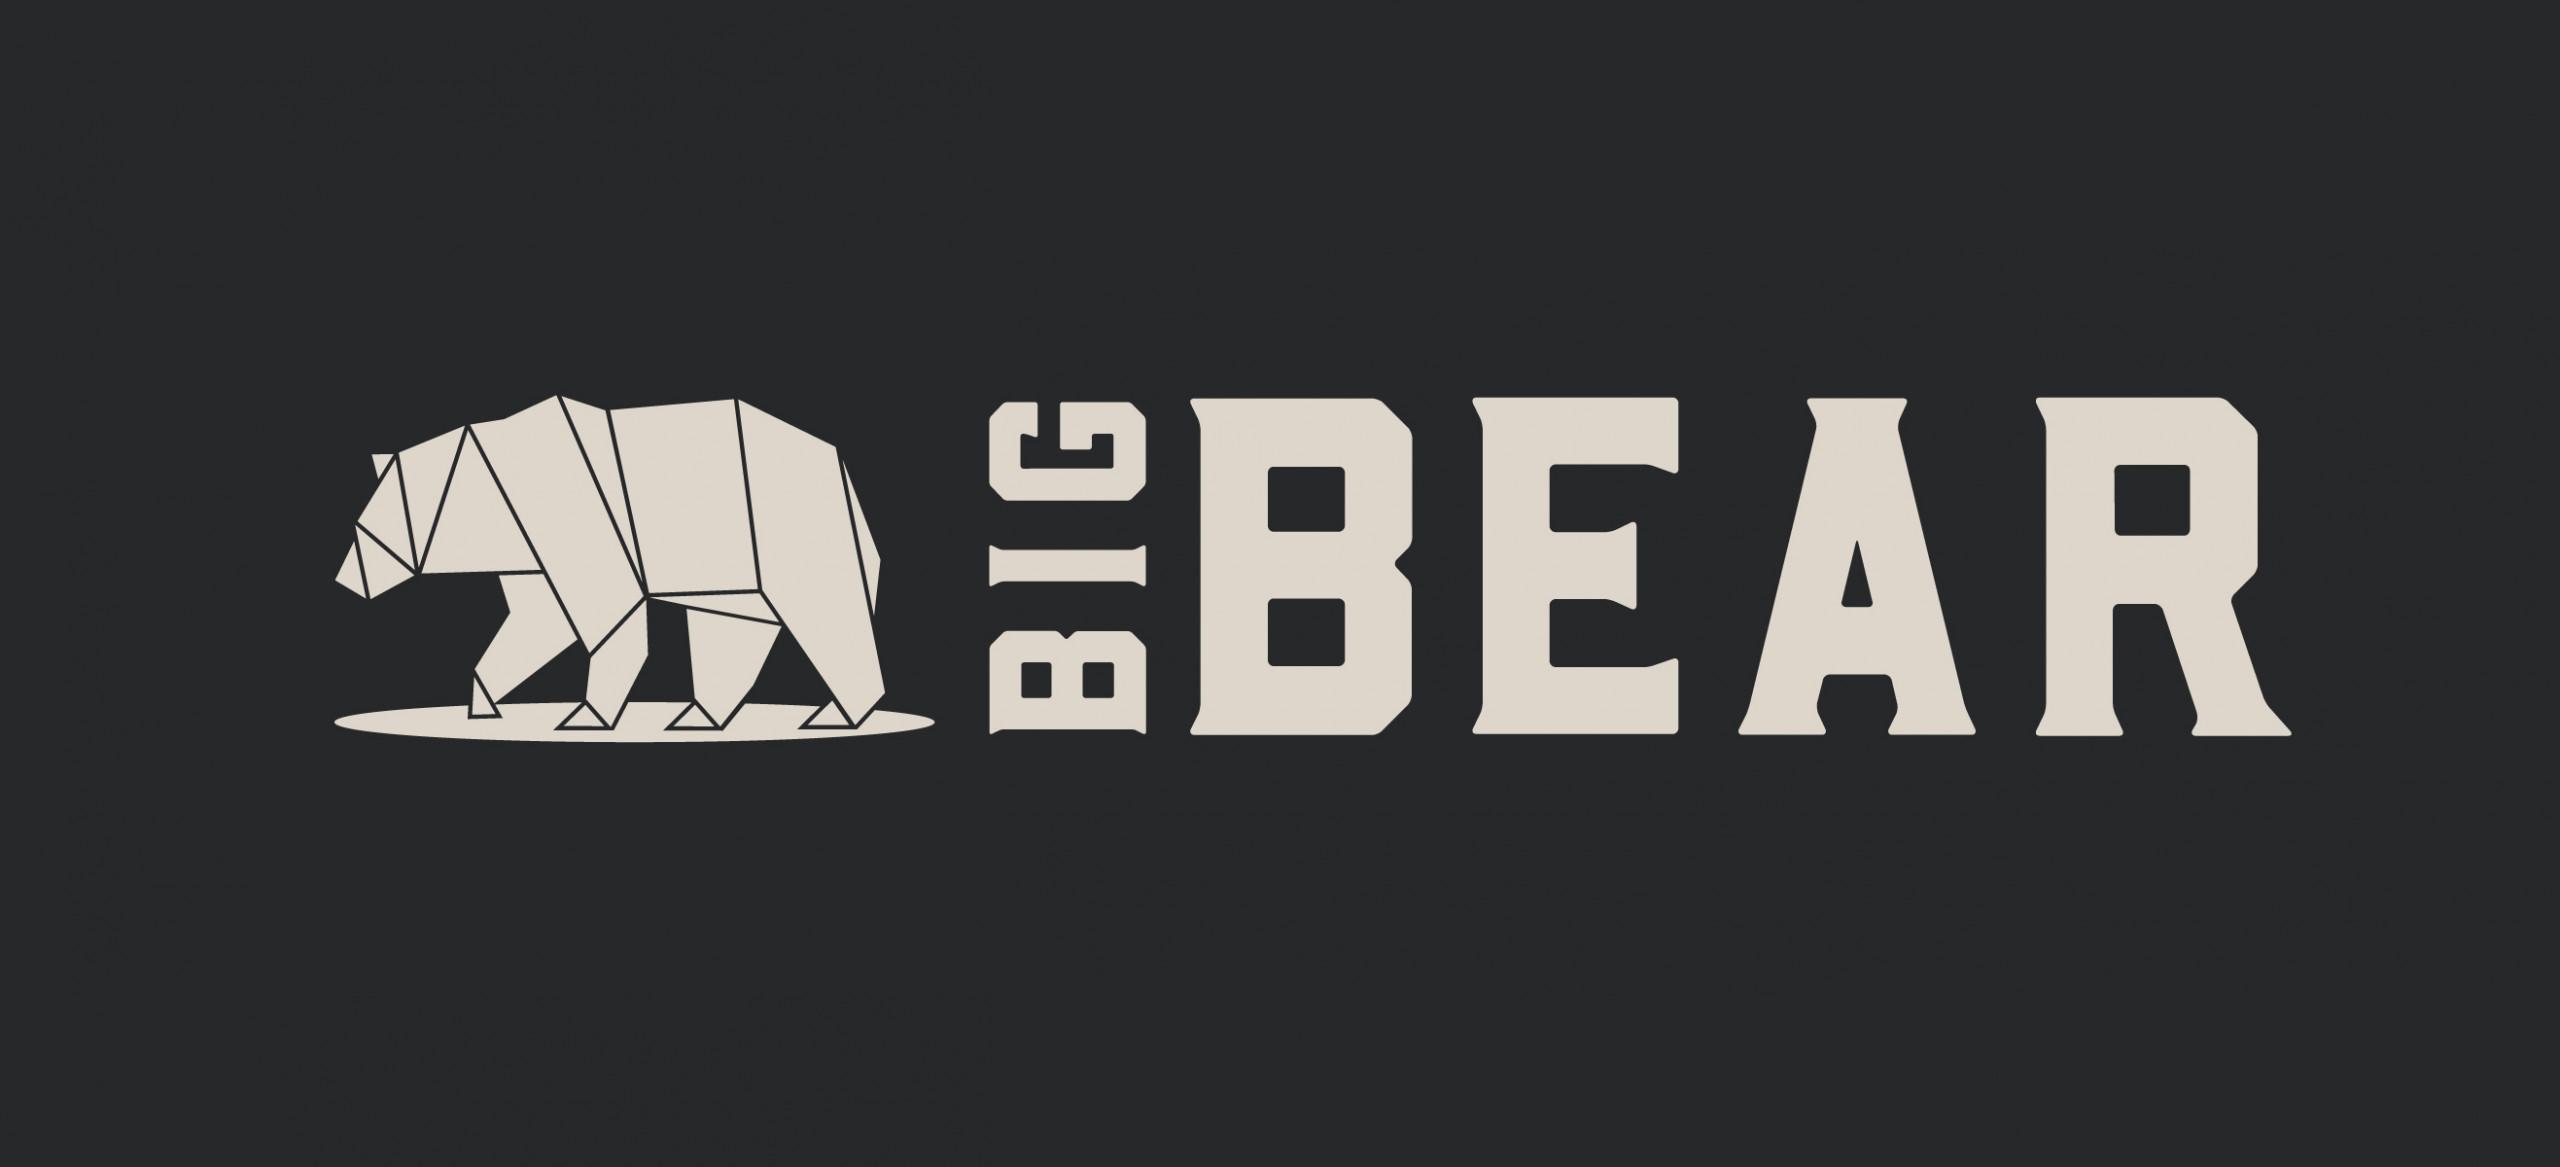 Big Bear >> logo design and branding